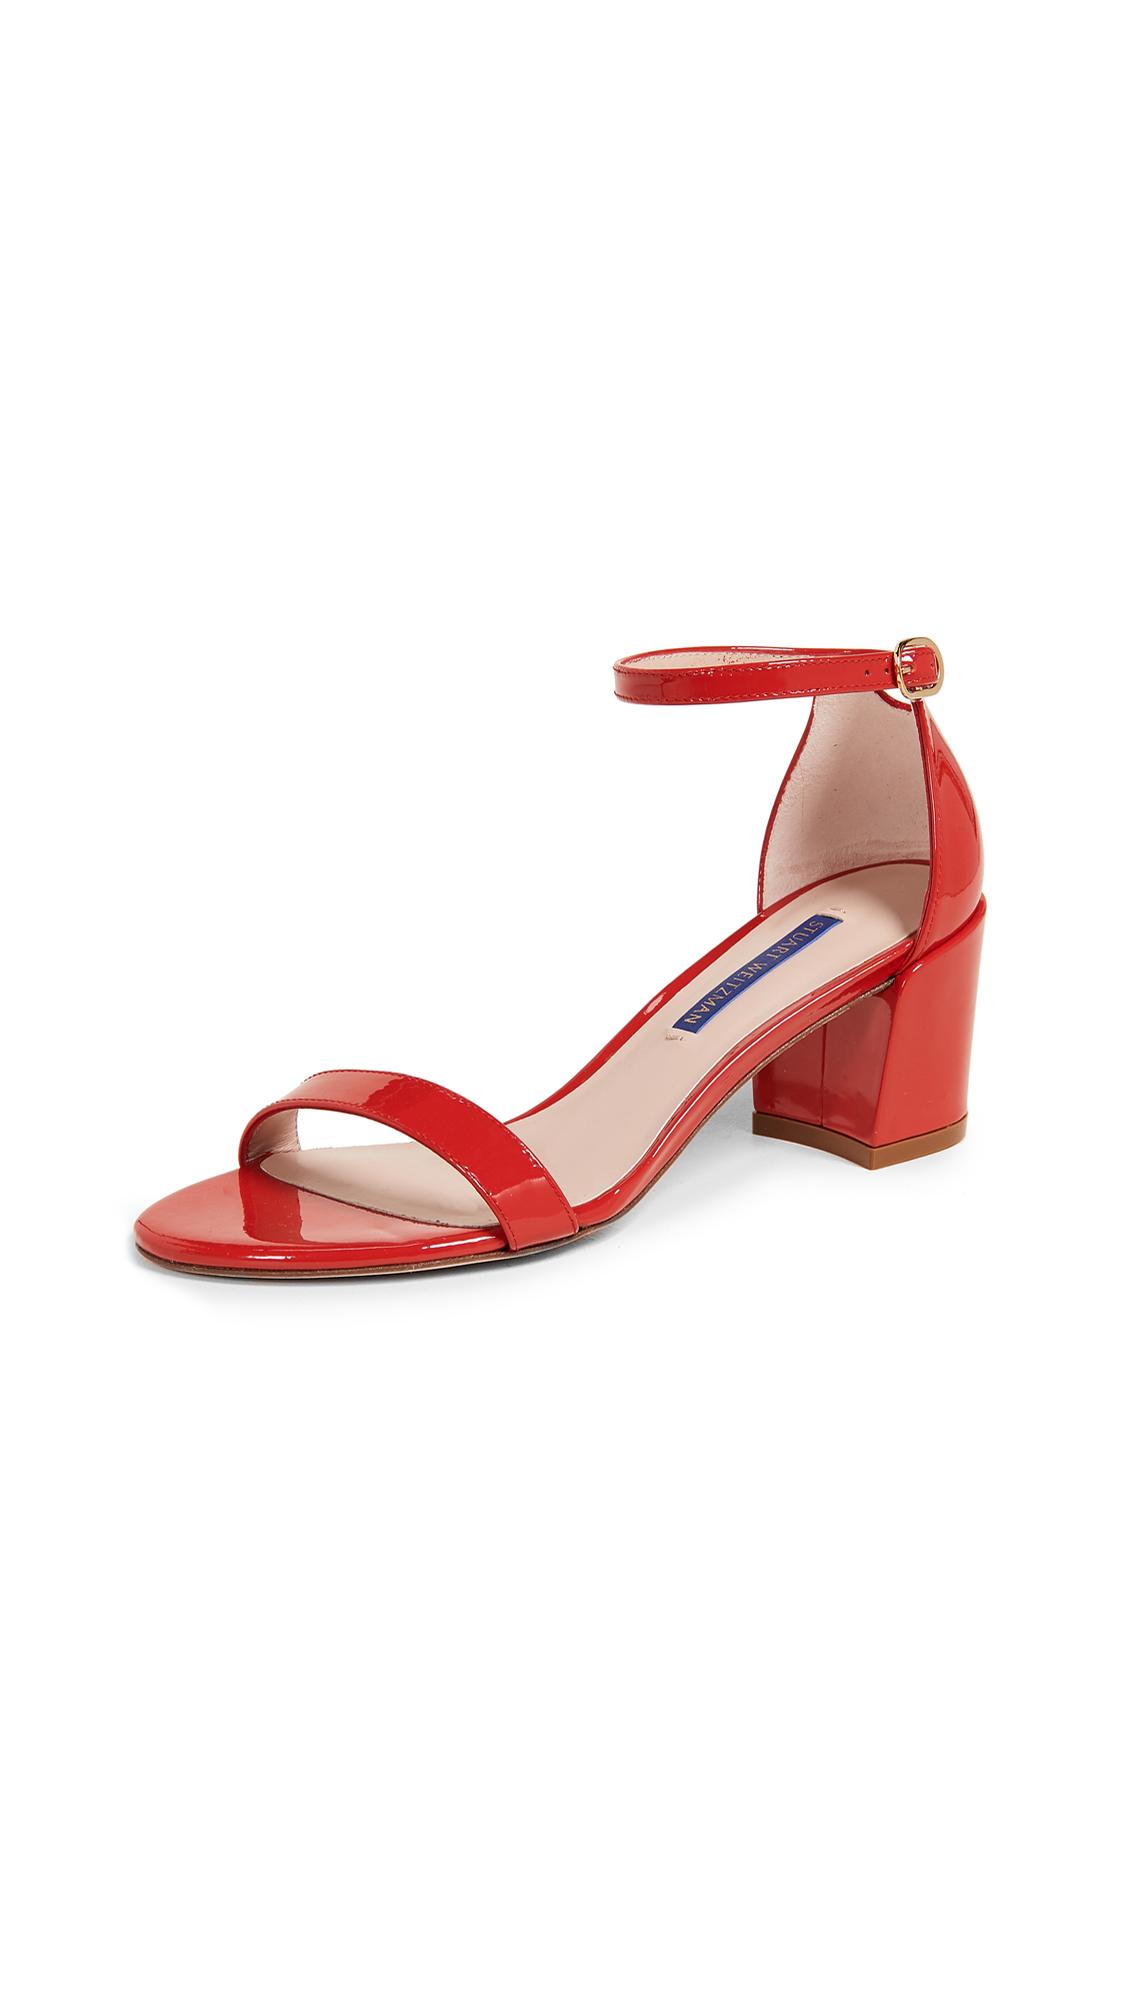 Stuart Weitzman Simple Sandals - Follow Me Red